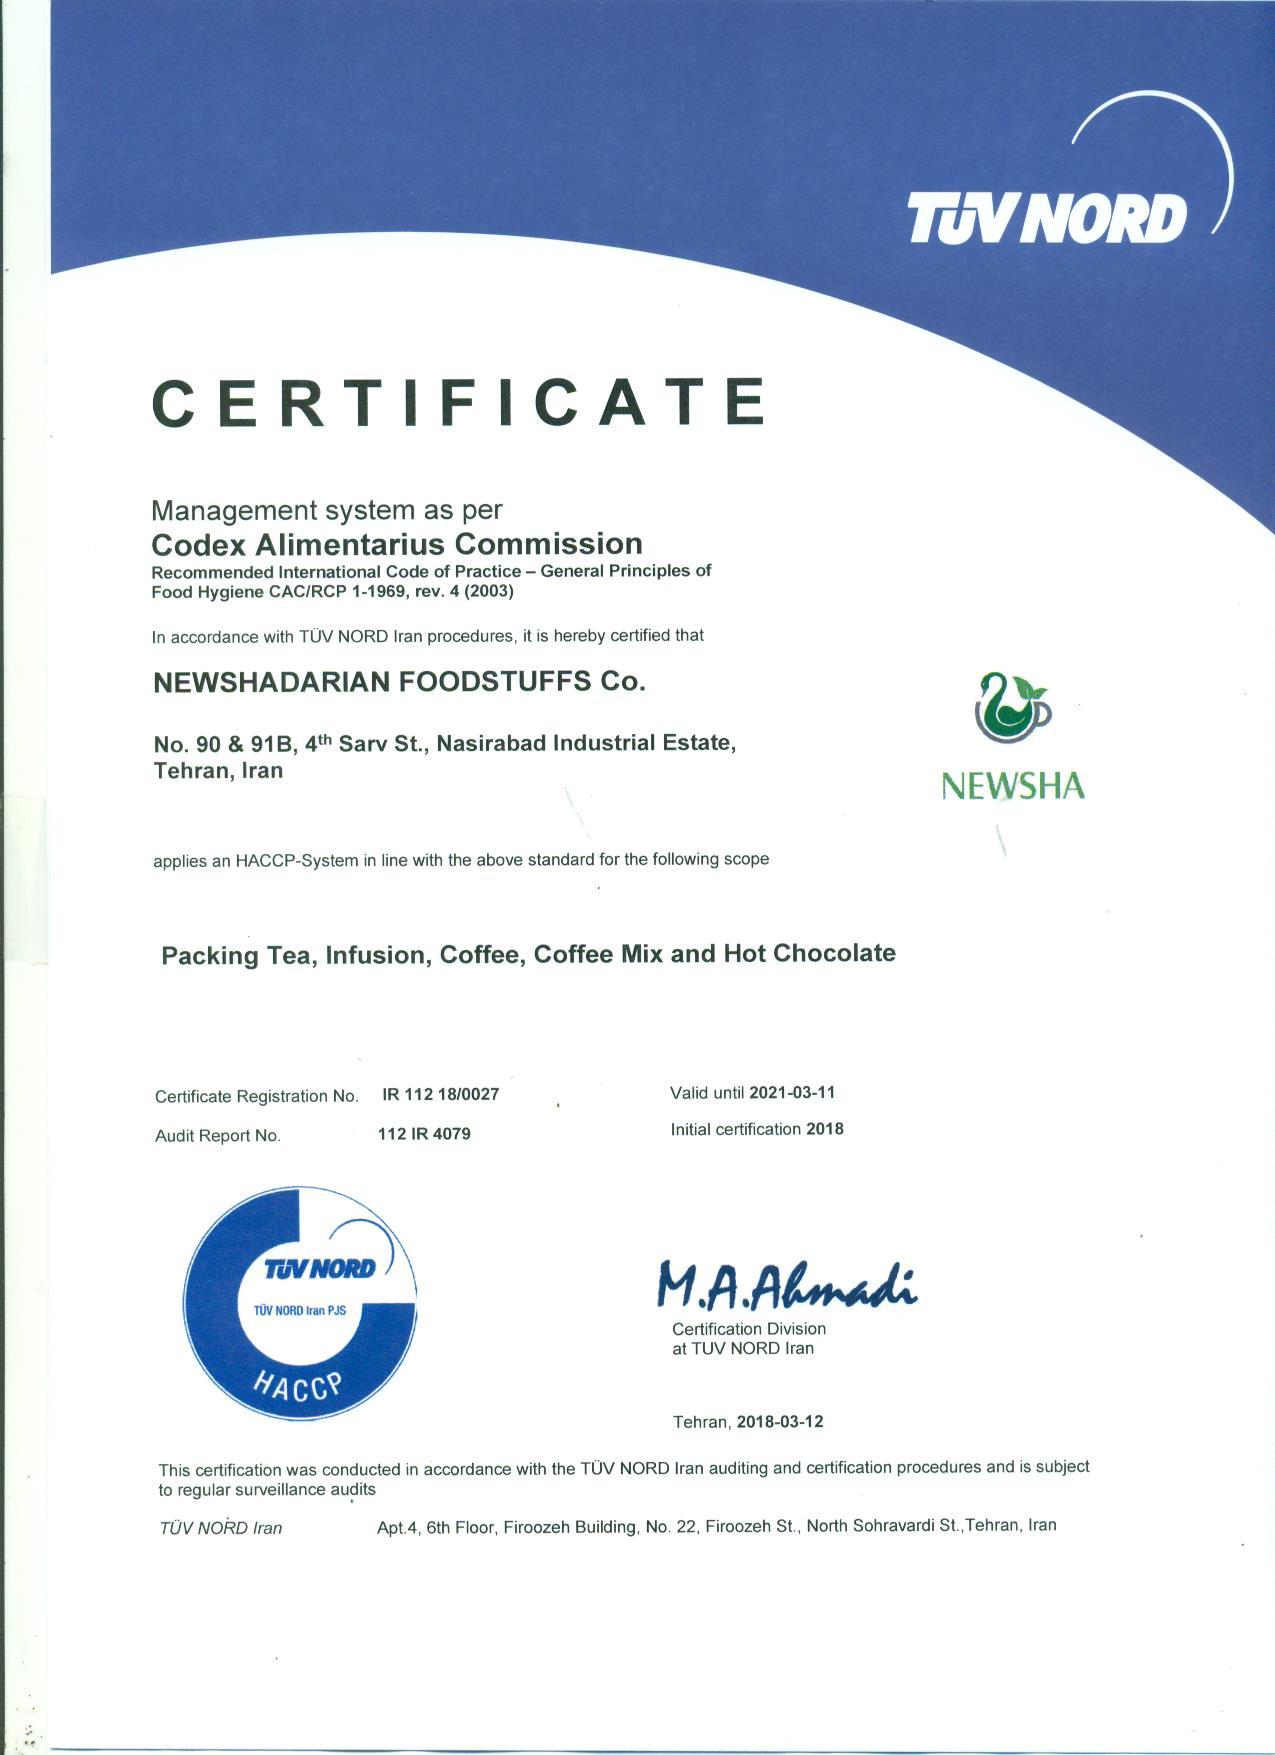 مجوز TUV NORD - HACCP نیوشا